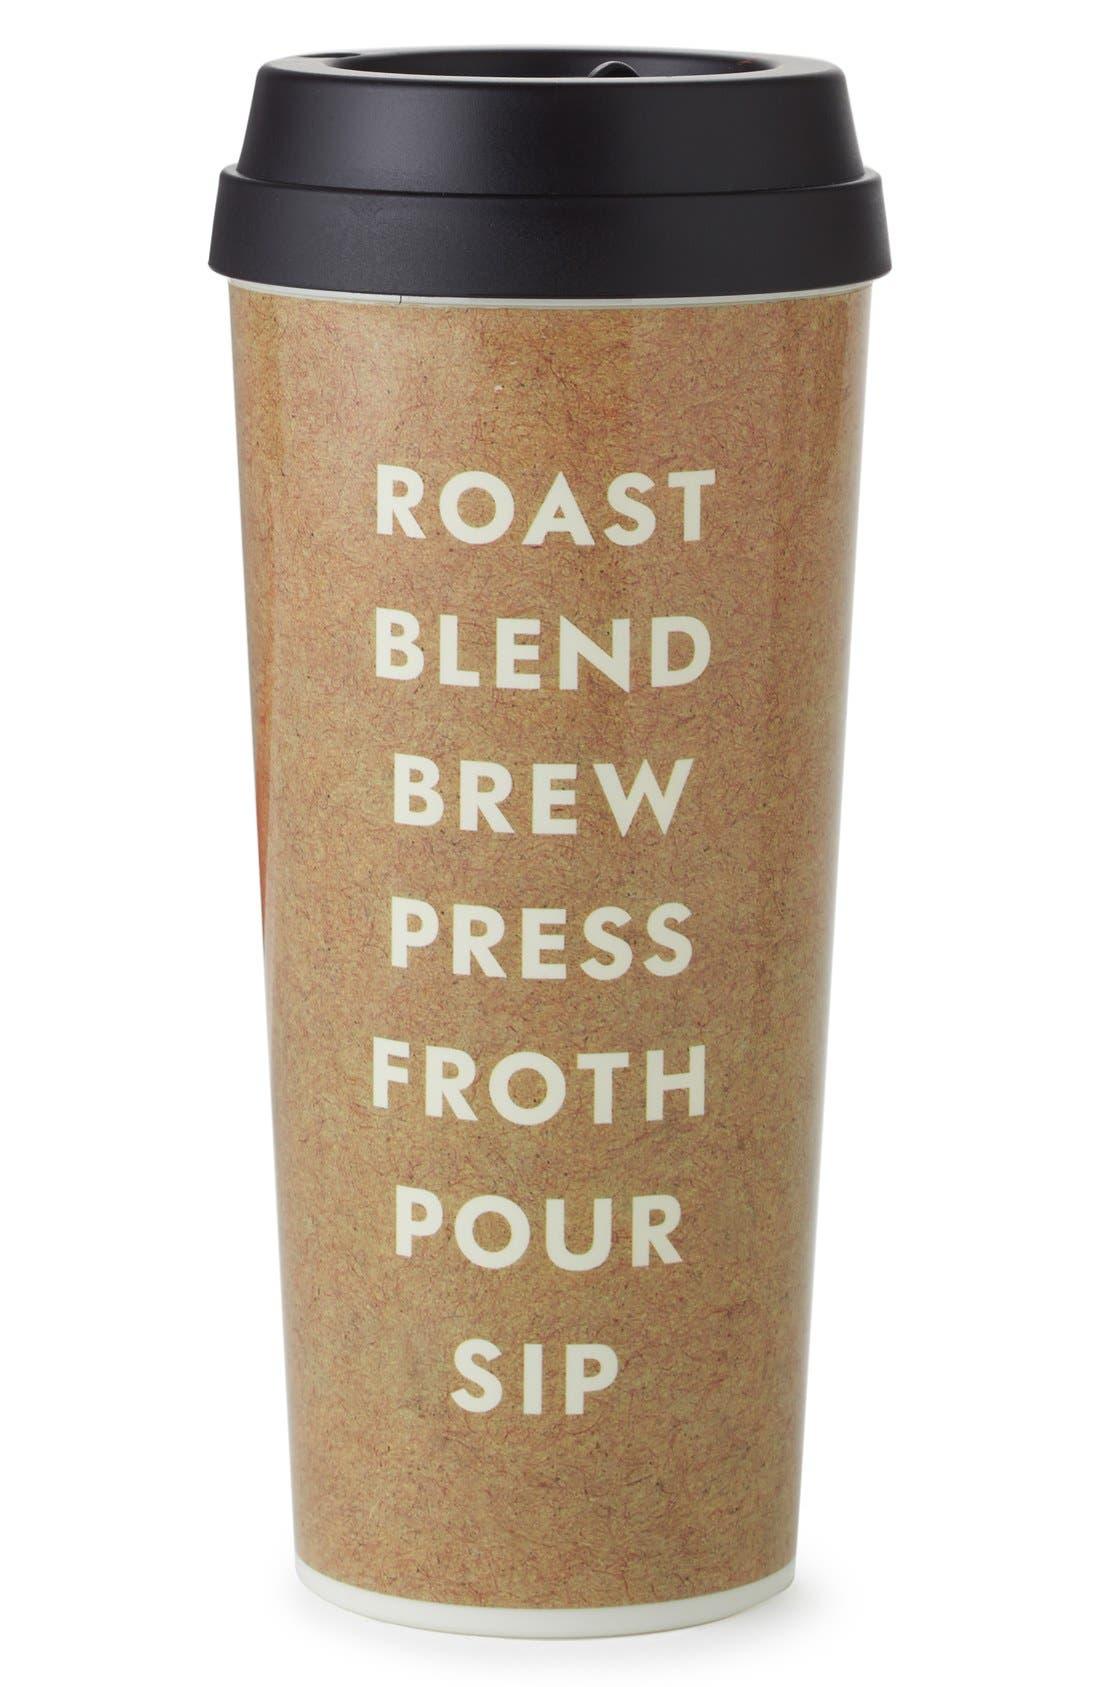 Main Image - kate spade new york 'roast blend brew press froth pour sip' thermal mug